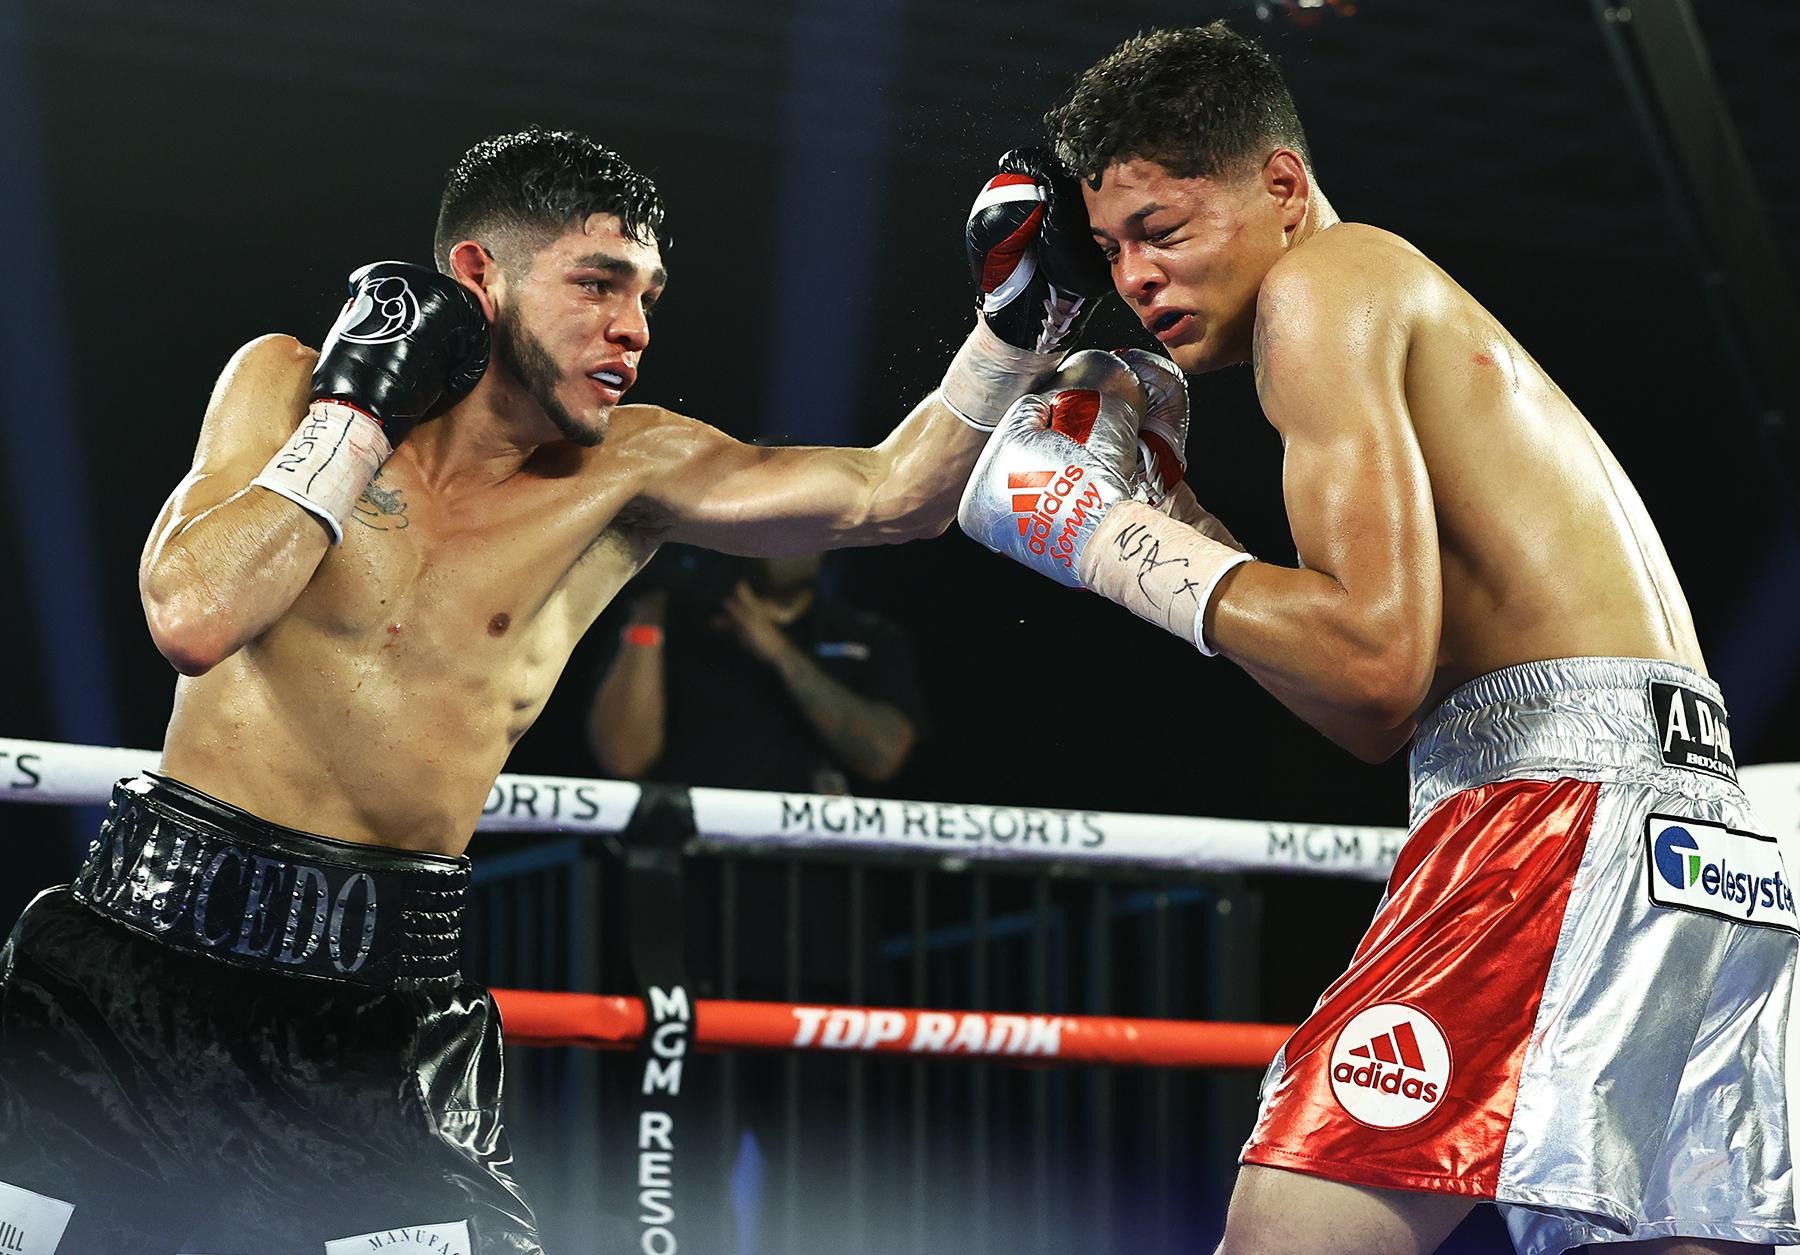 Alex Saucedo vs Sonny Fredrickson action9 - Alex Saucedo: I can beat either Josh Taylor or Jose Ramirez